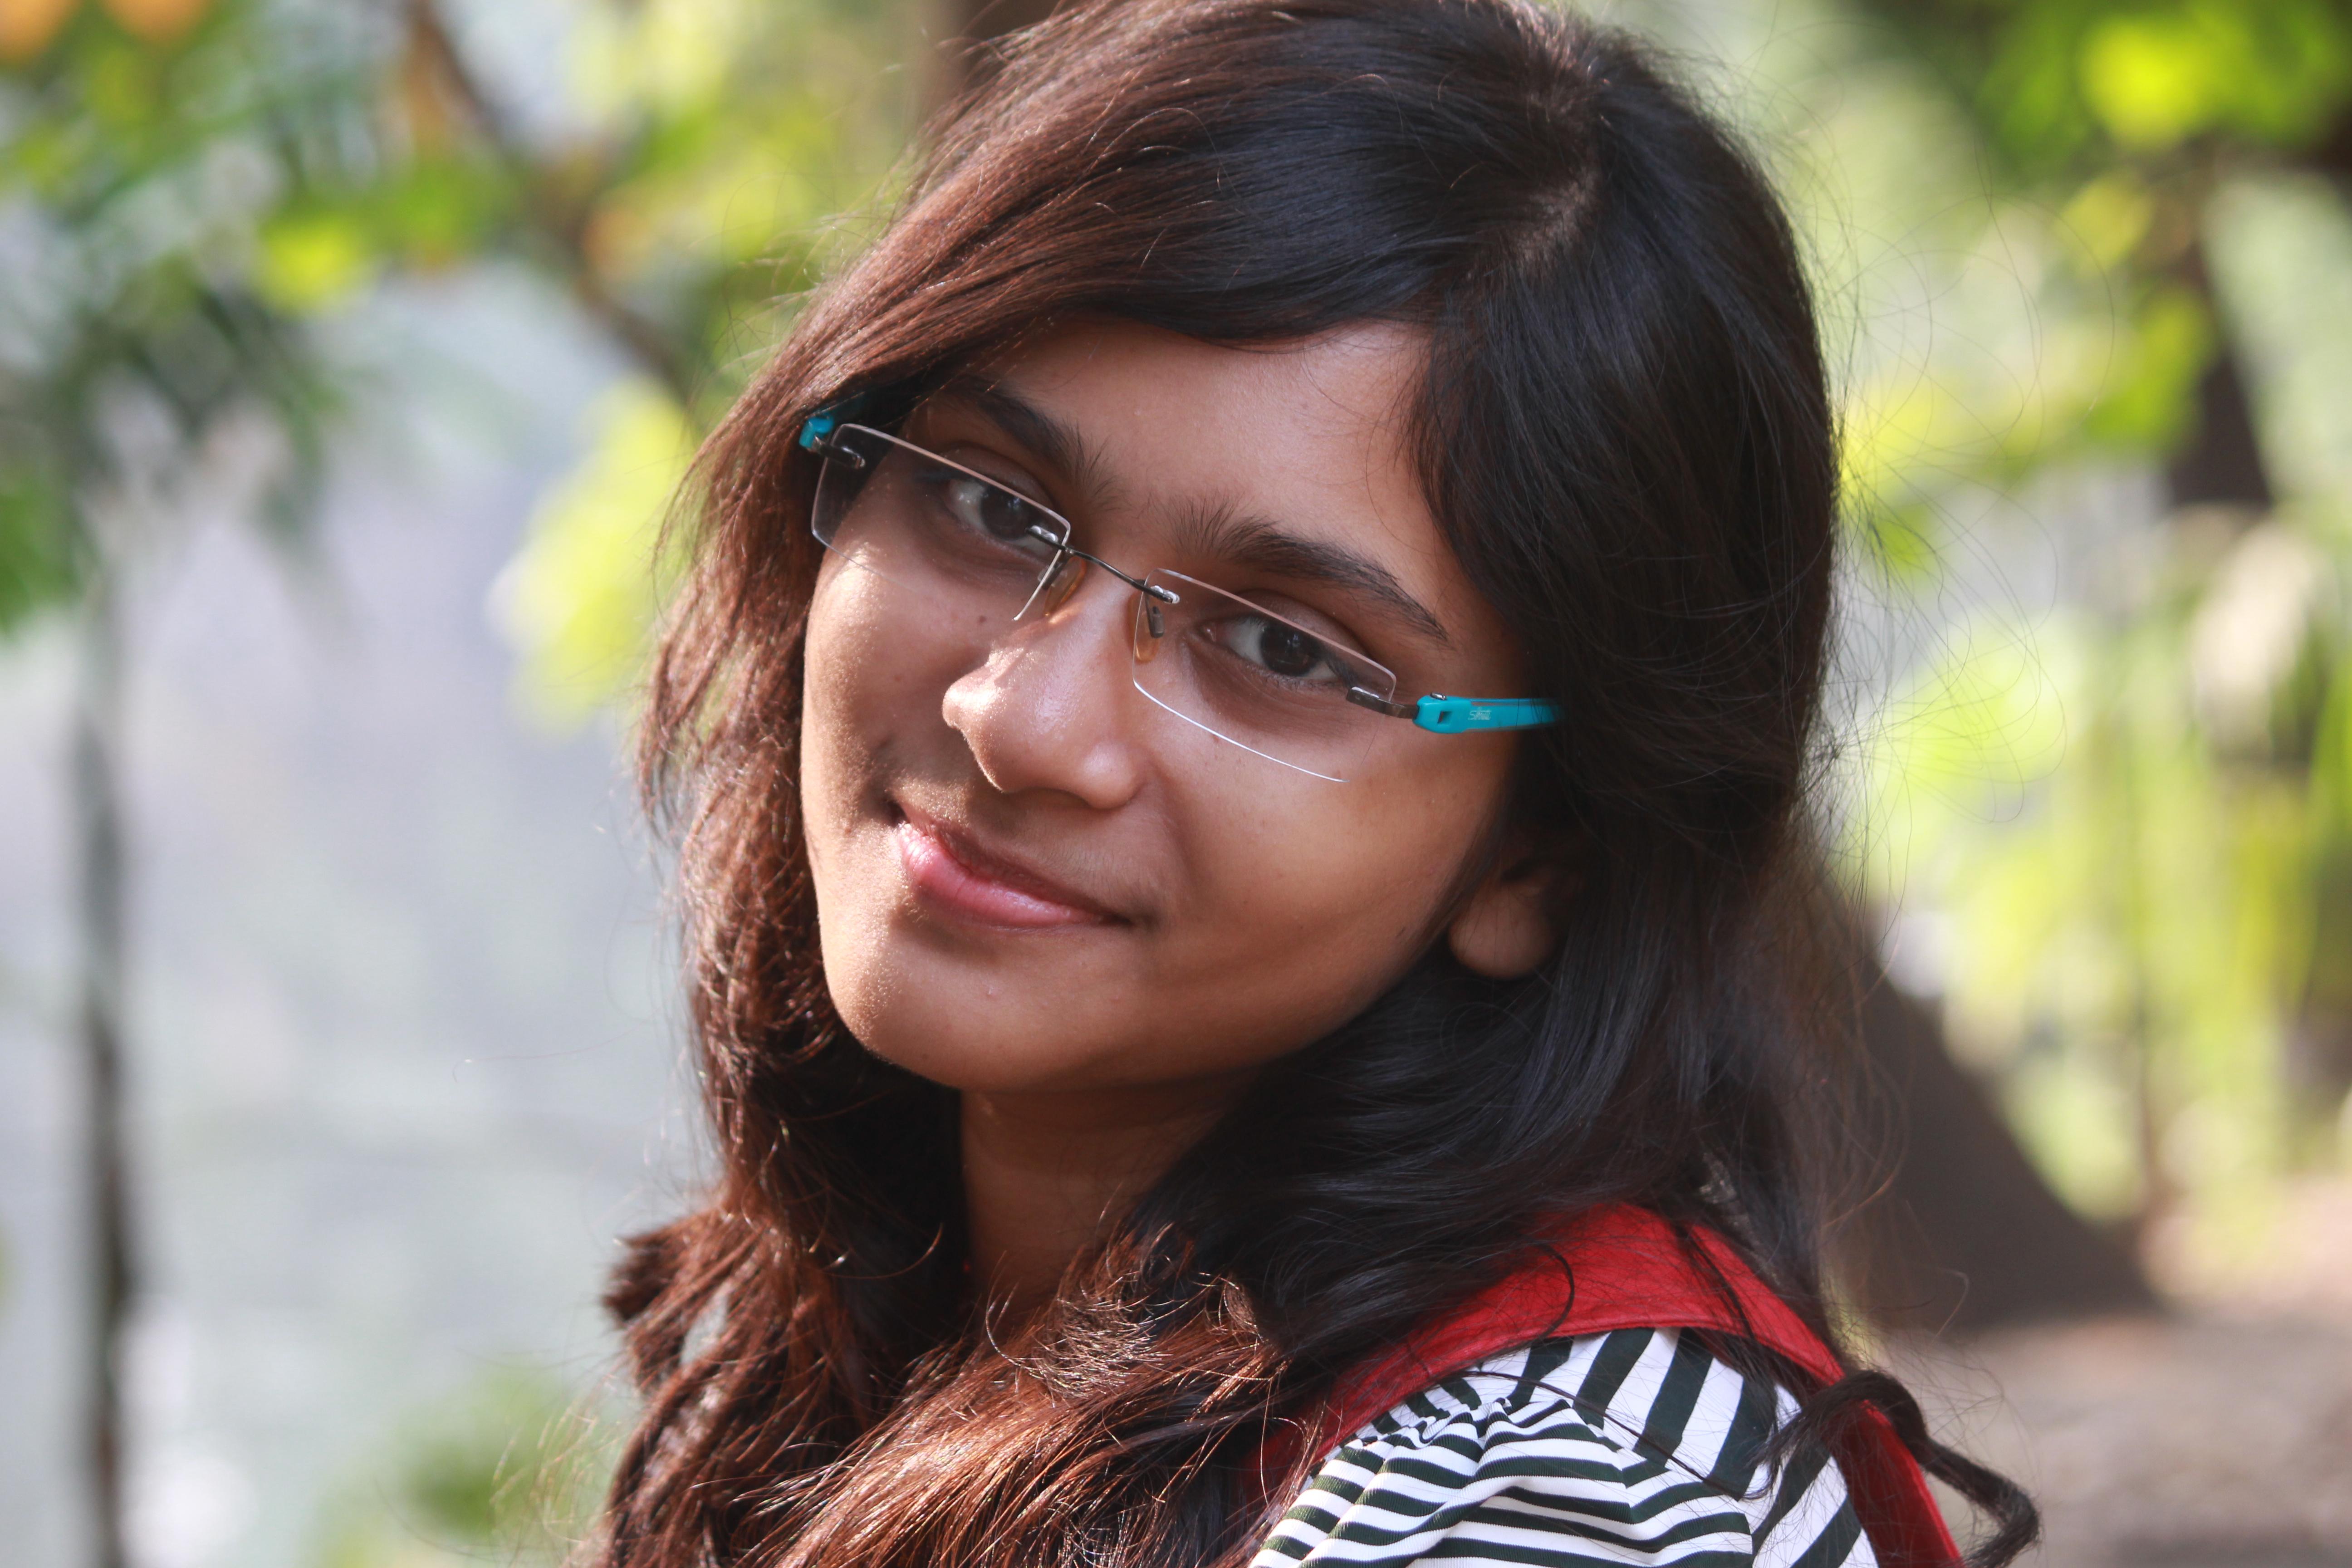 university park hindu single women Meet single women in university park pa online & chat in the forums dhu is a 100% free dating site to find single women in university park.